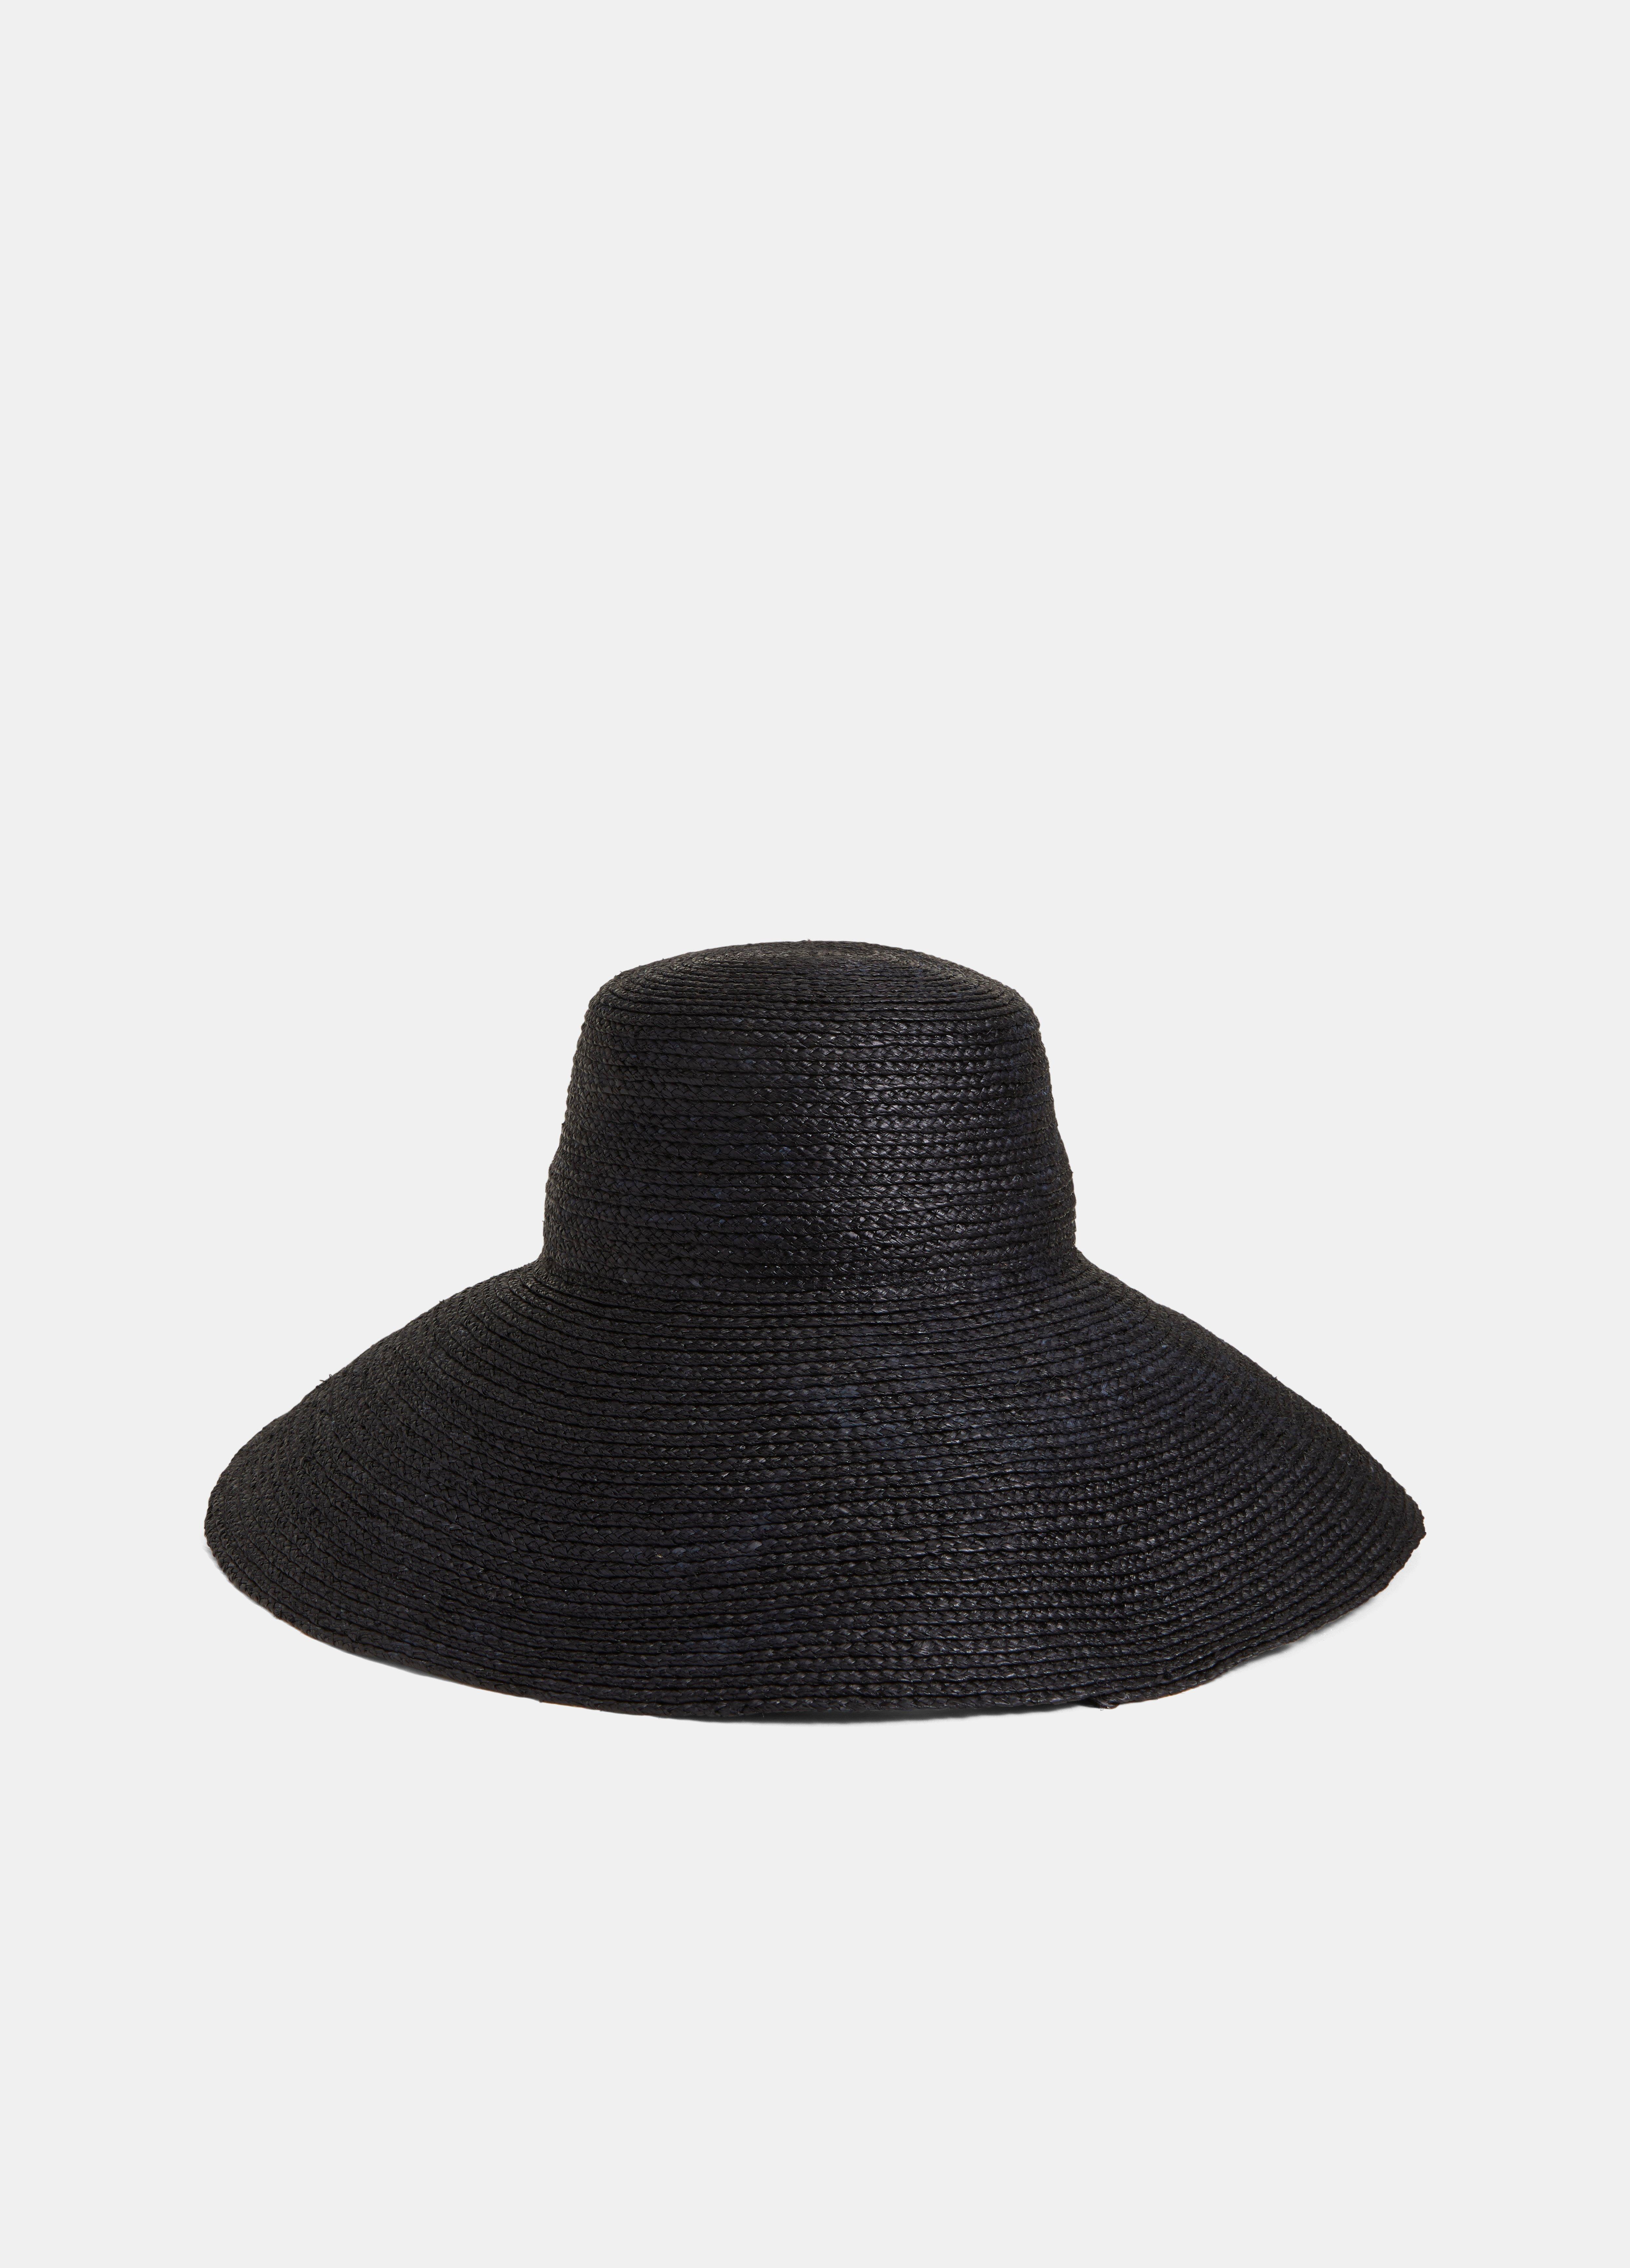 Janessa Leoné / Niki Hat